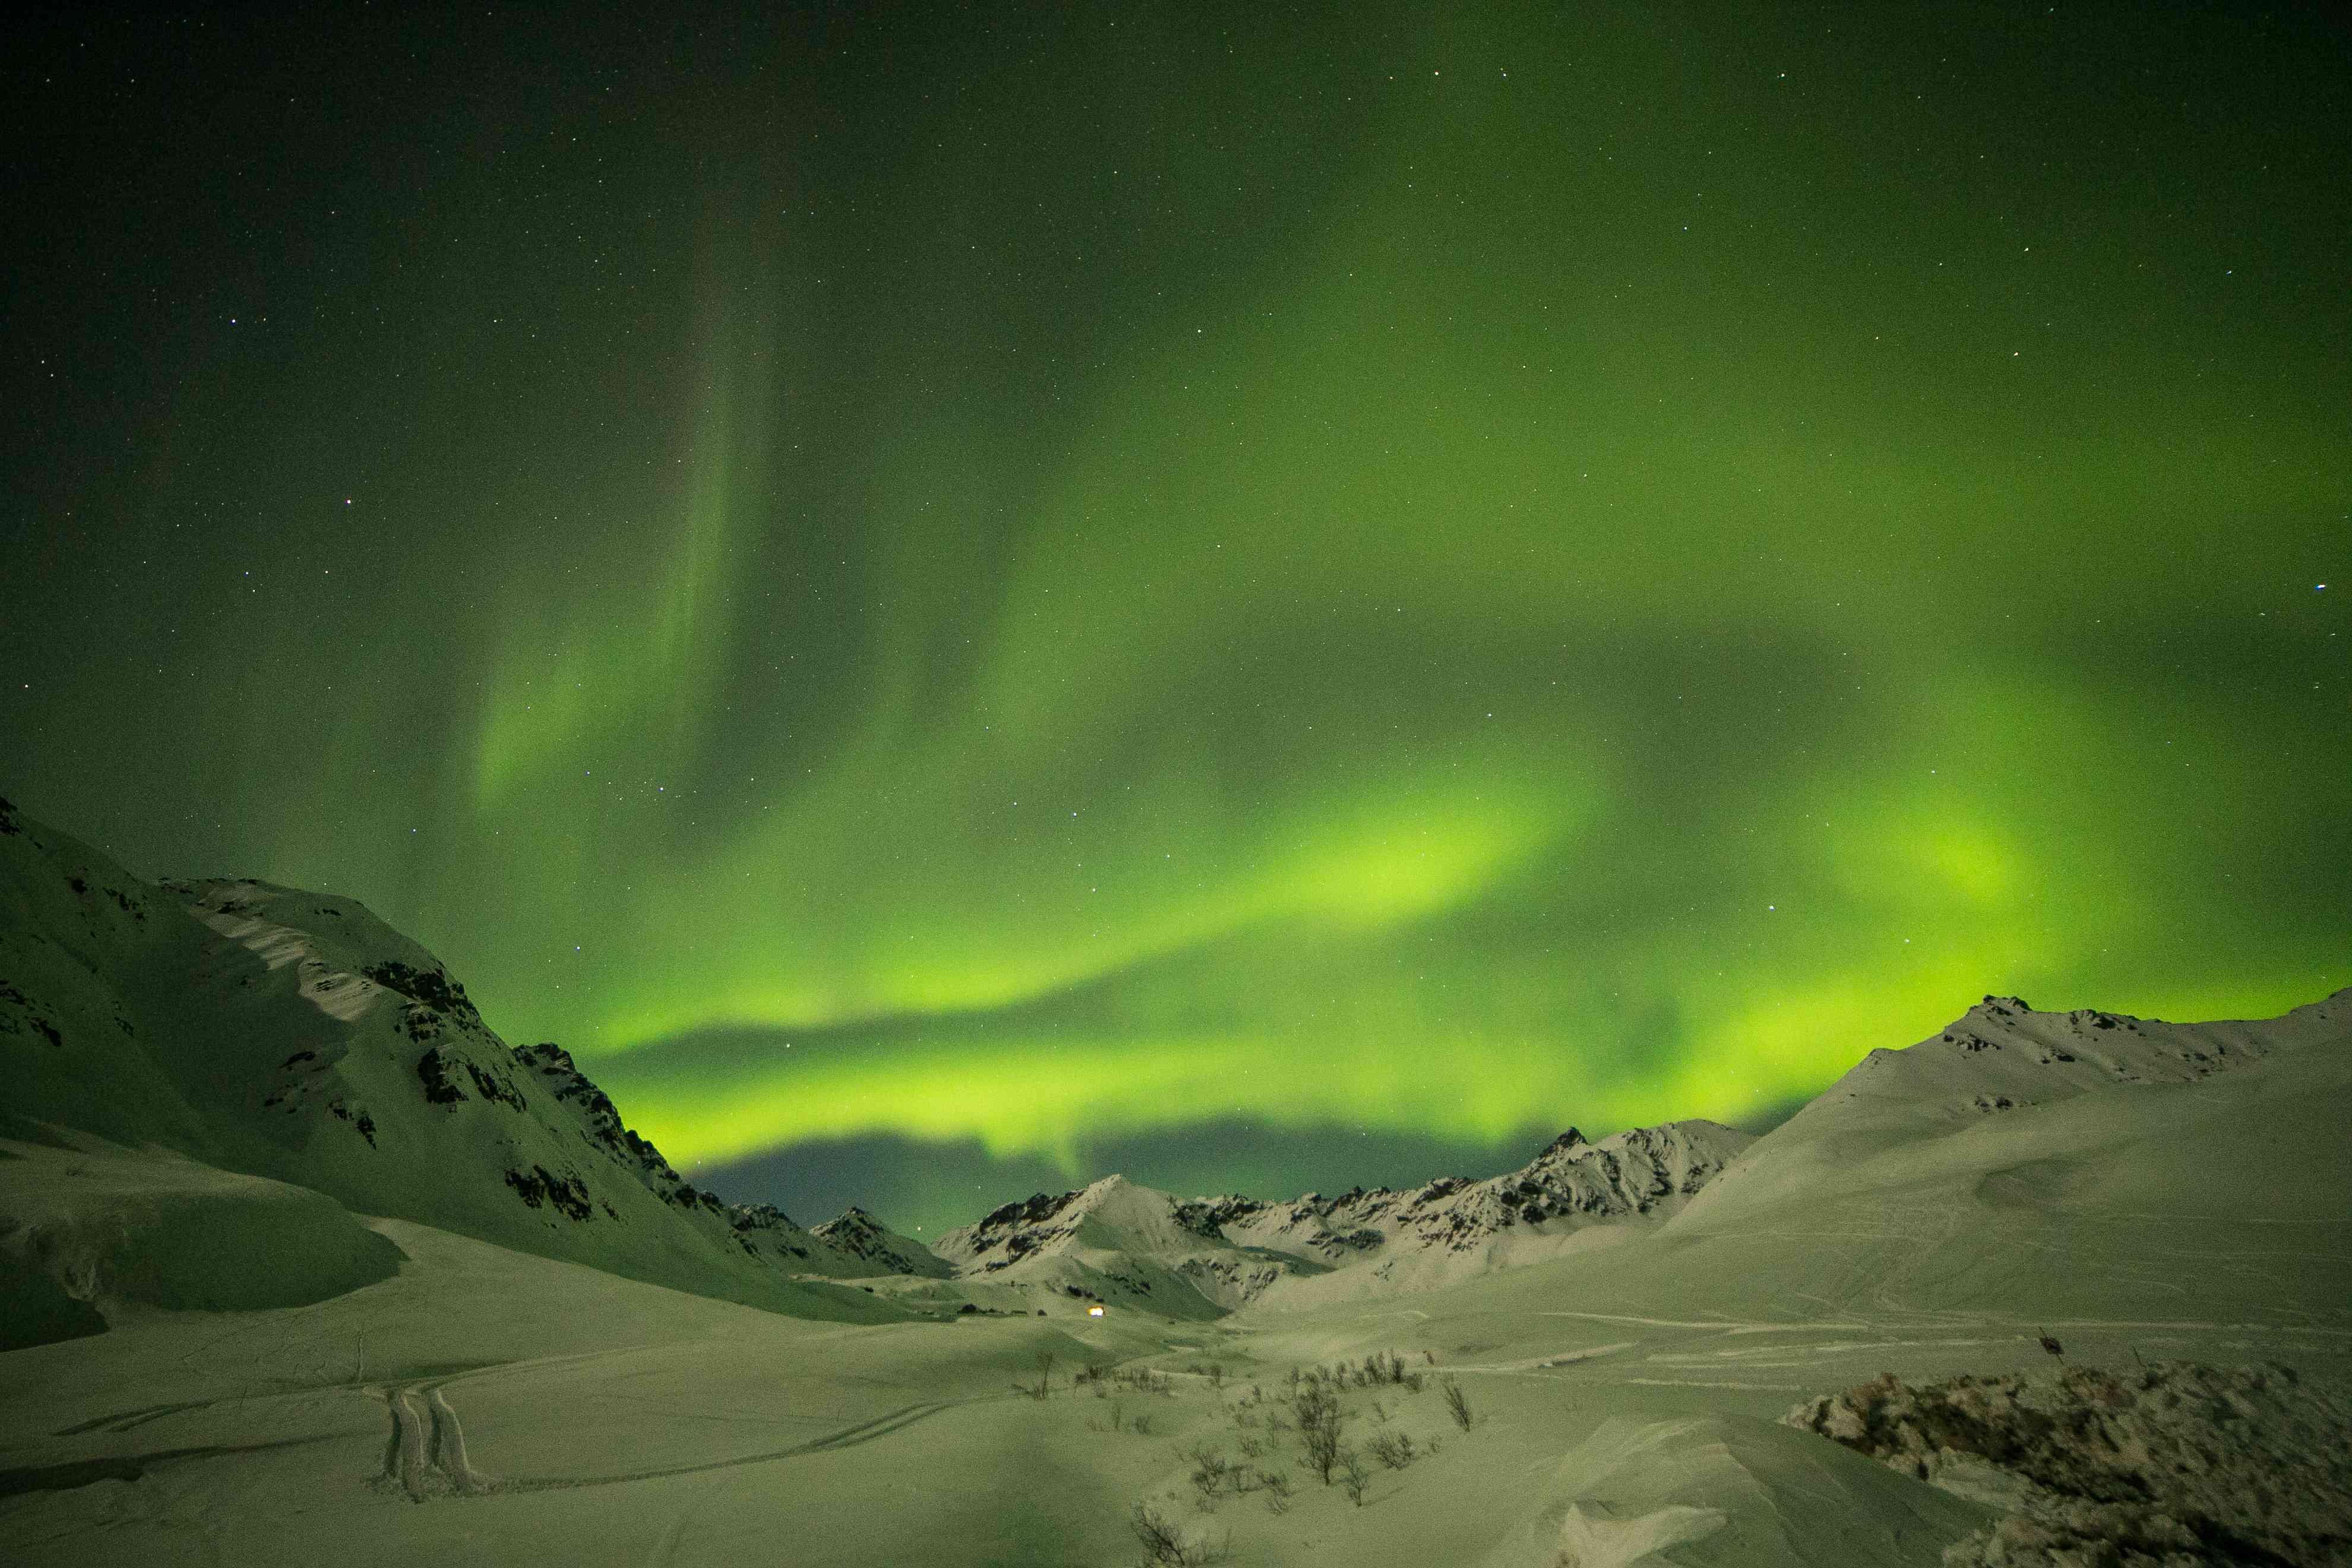 The aurora borealis at winter